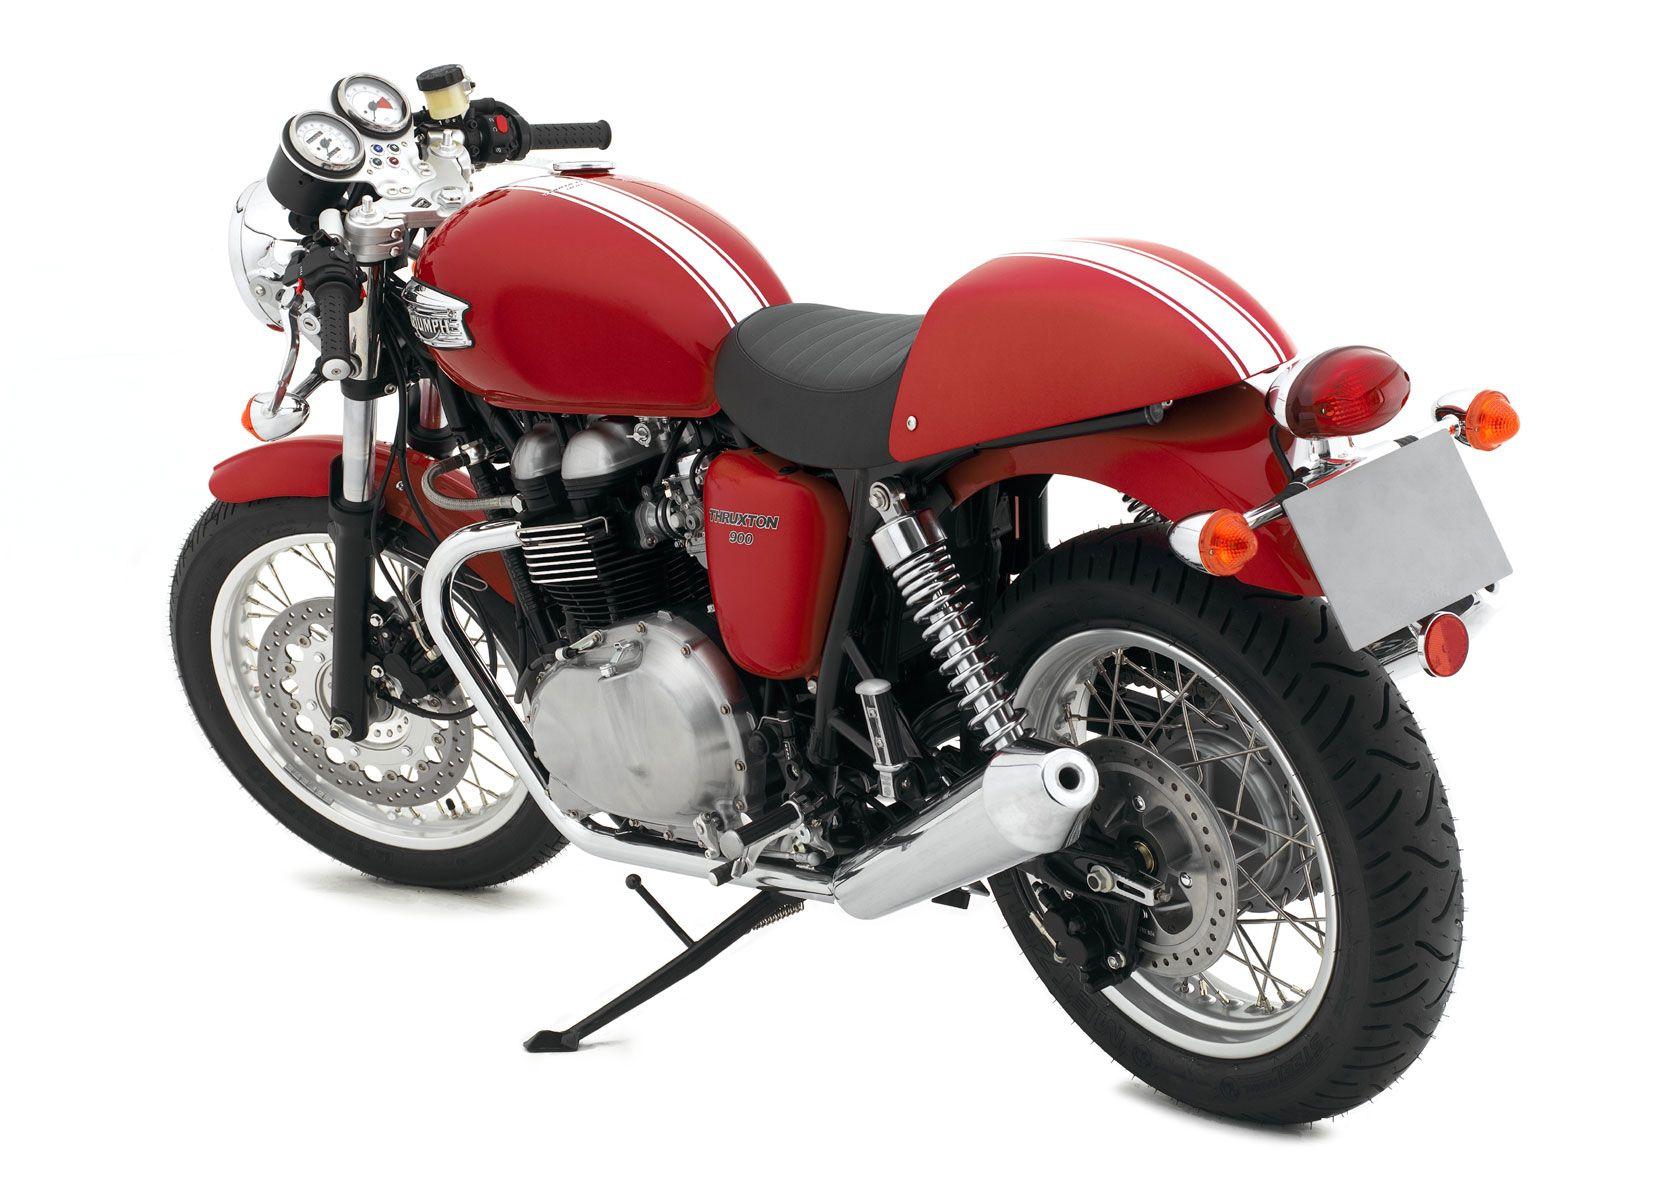 Triumph Thruxton | Motos legend | Pinterest | Triumph thruxton 900 ...